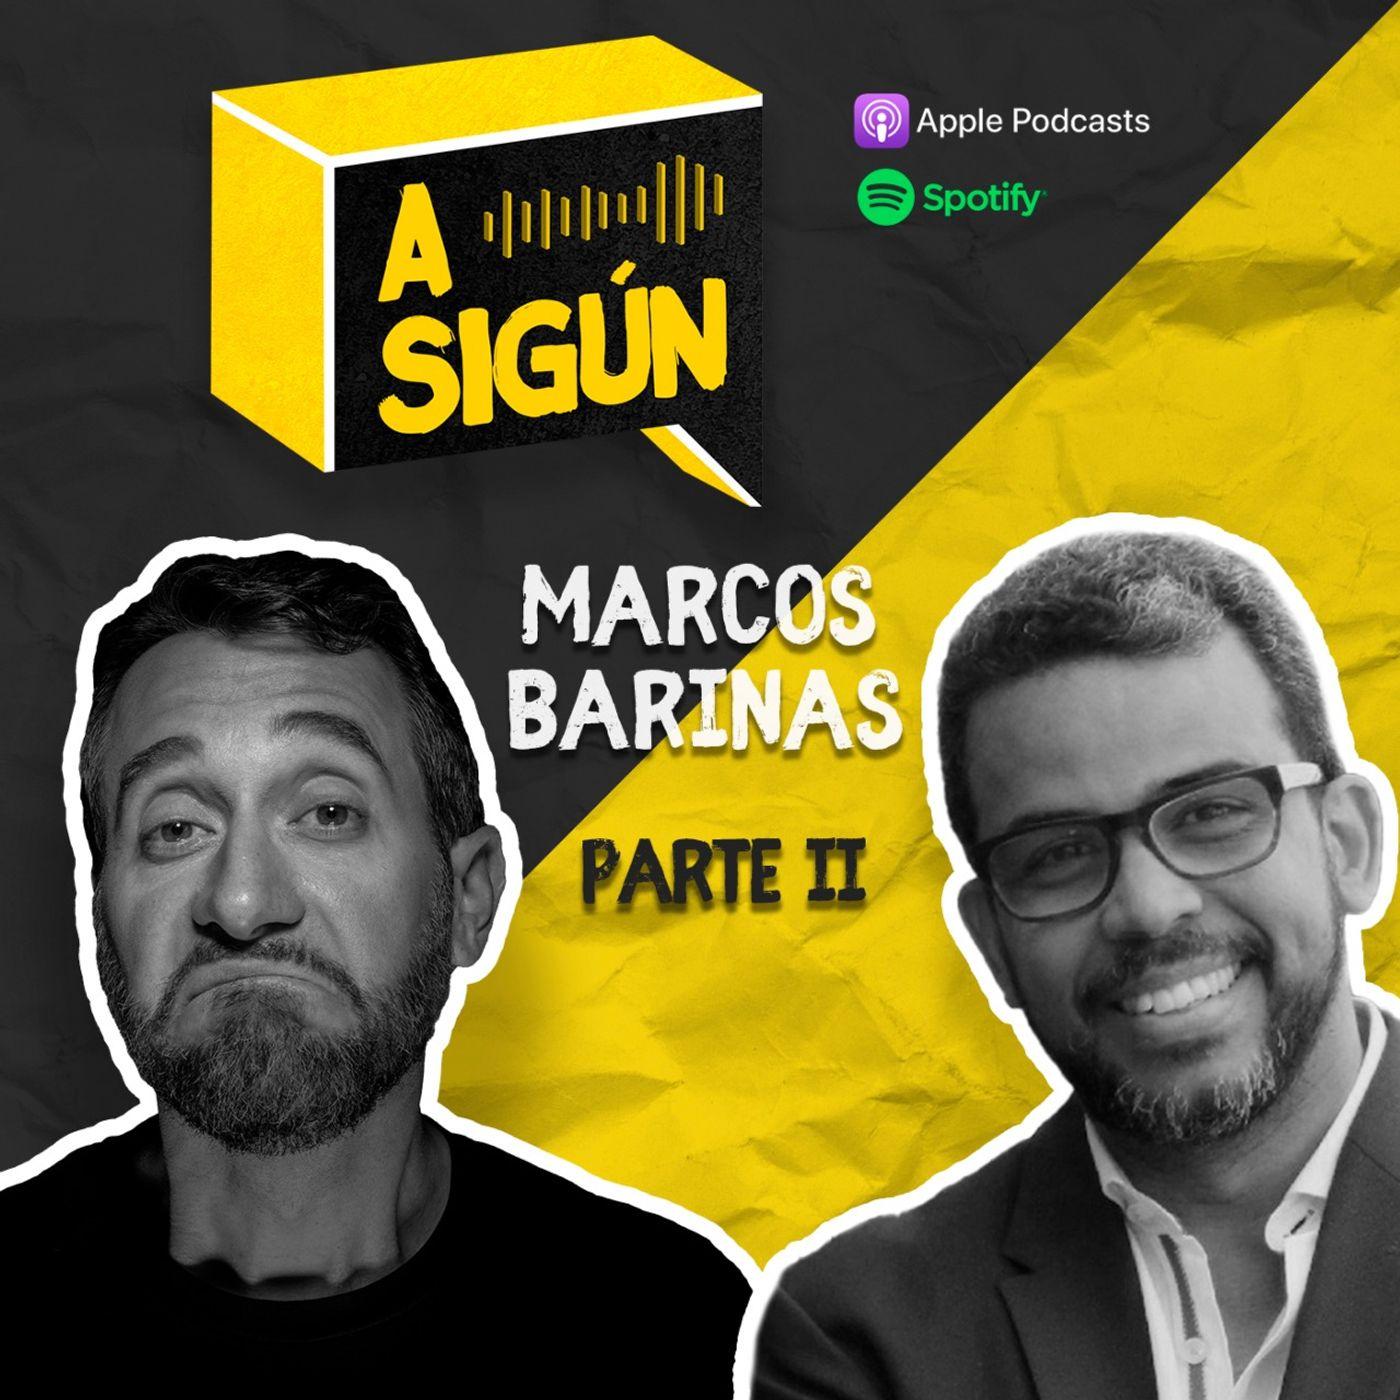 005. A SIGÚN: Marcos Barinas PT2